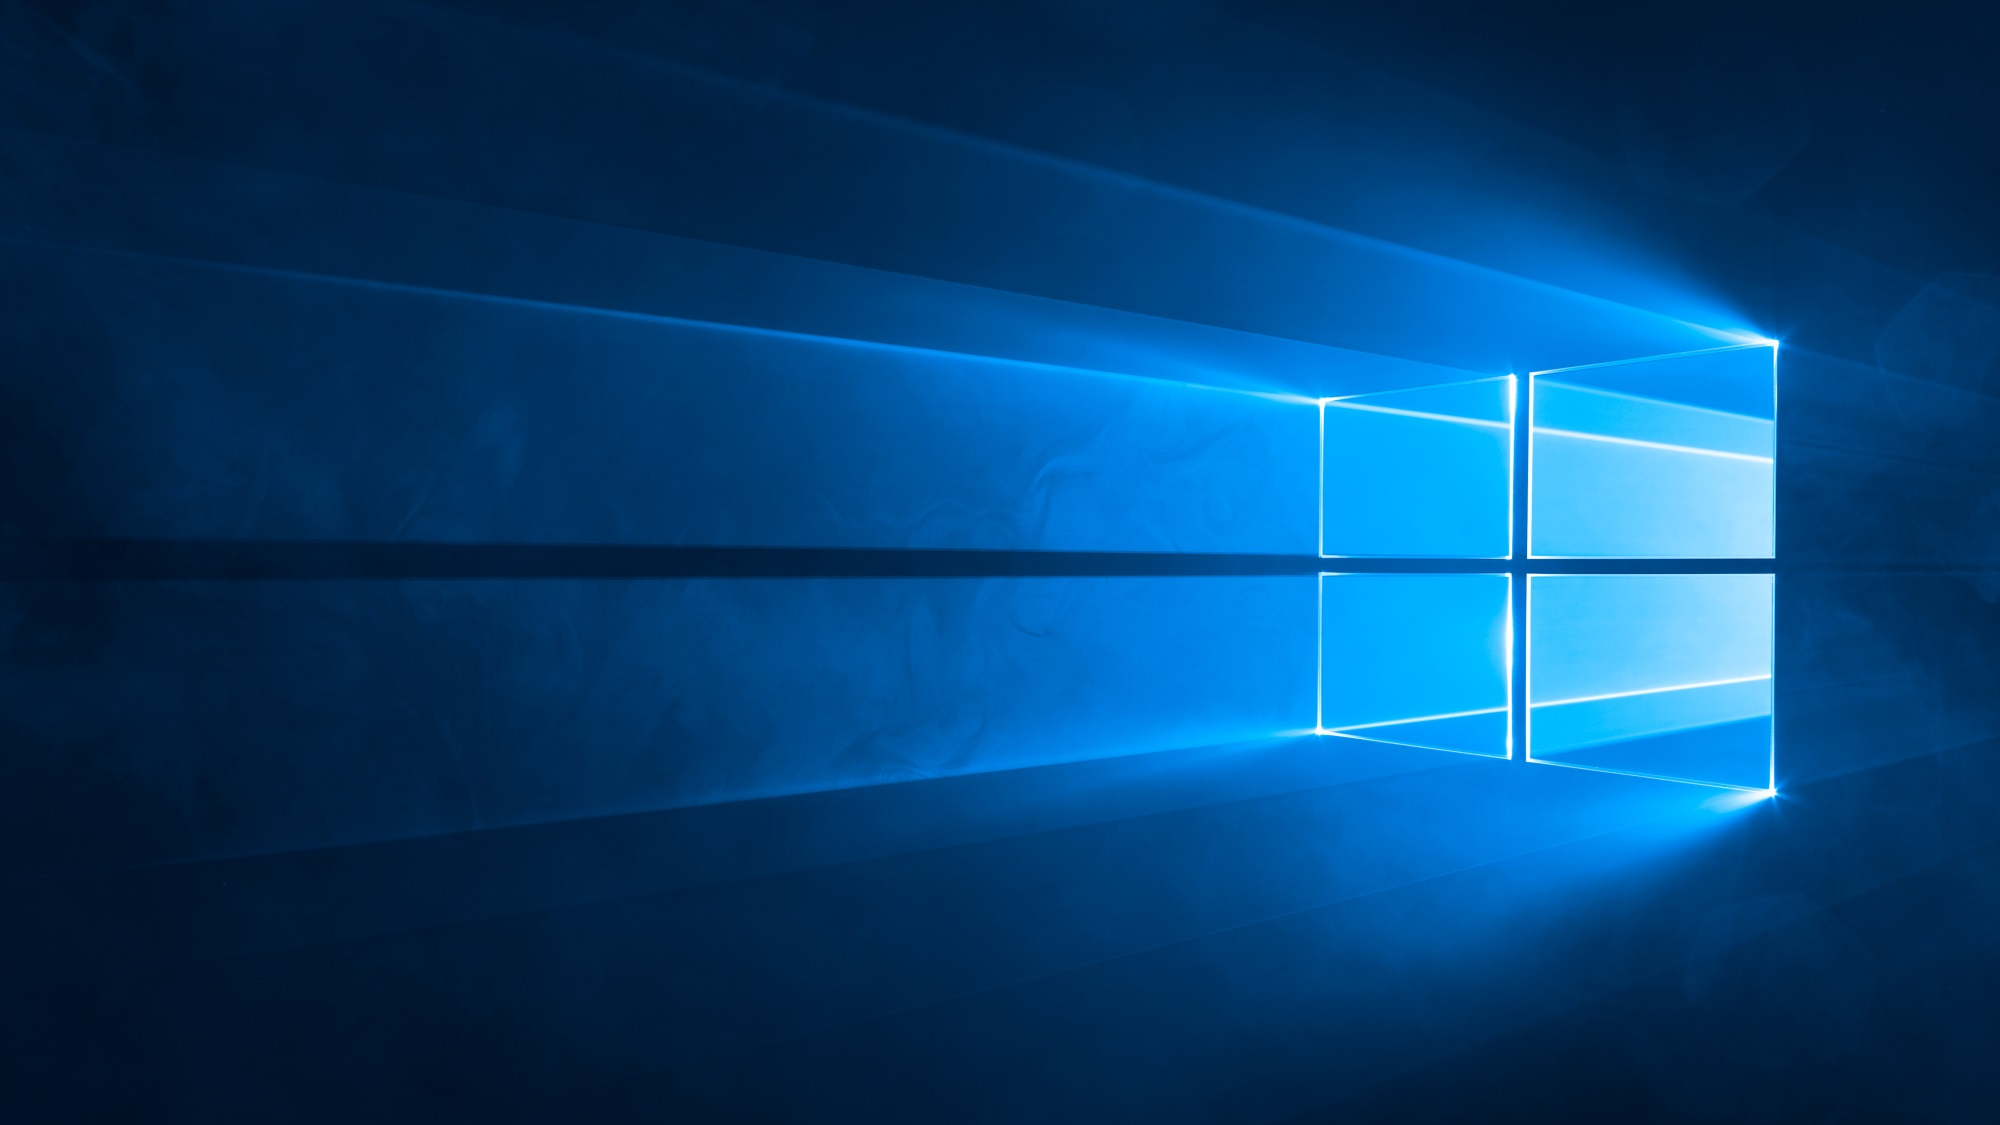 Windows 10 hits 9 market share El Capitan takes first among OS X 2000x1125